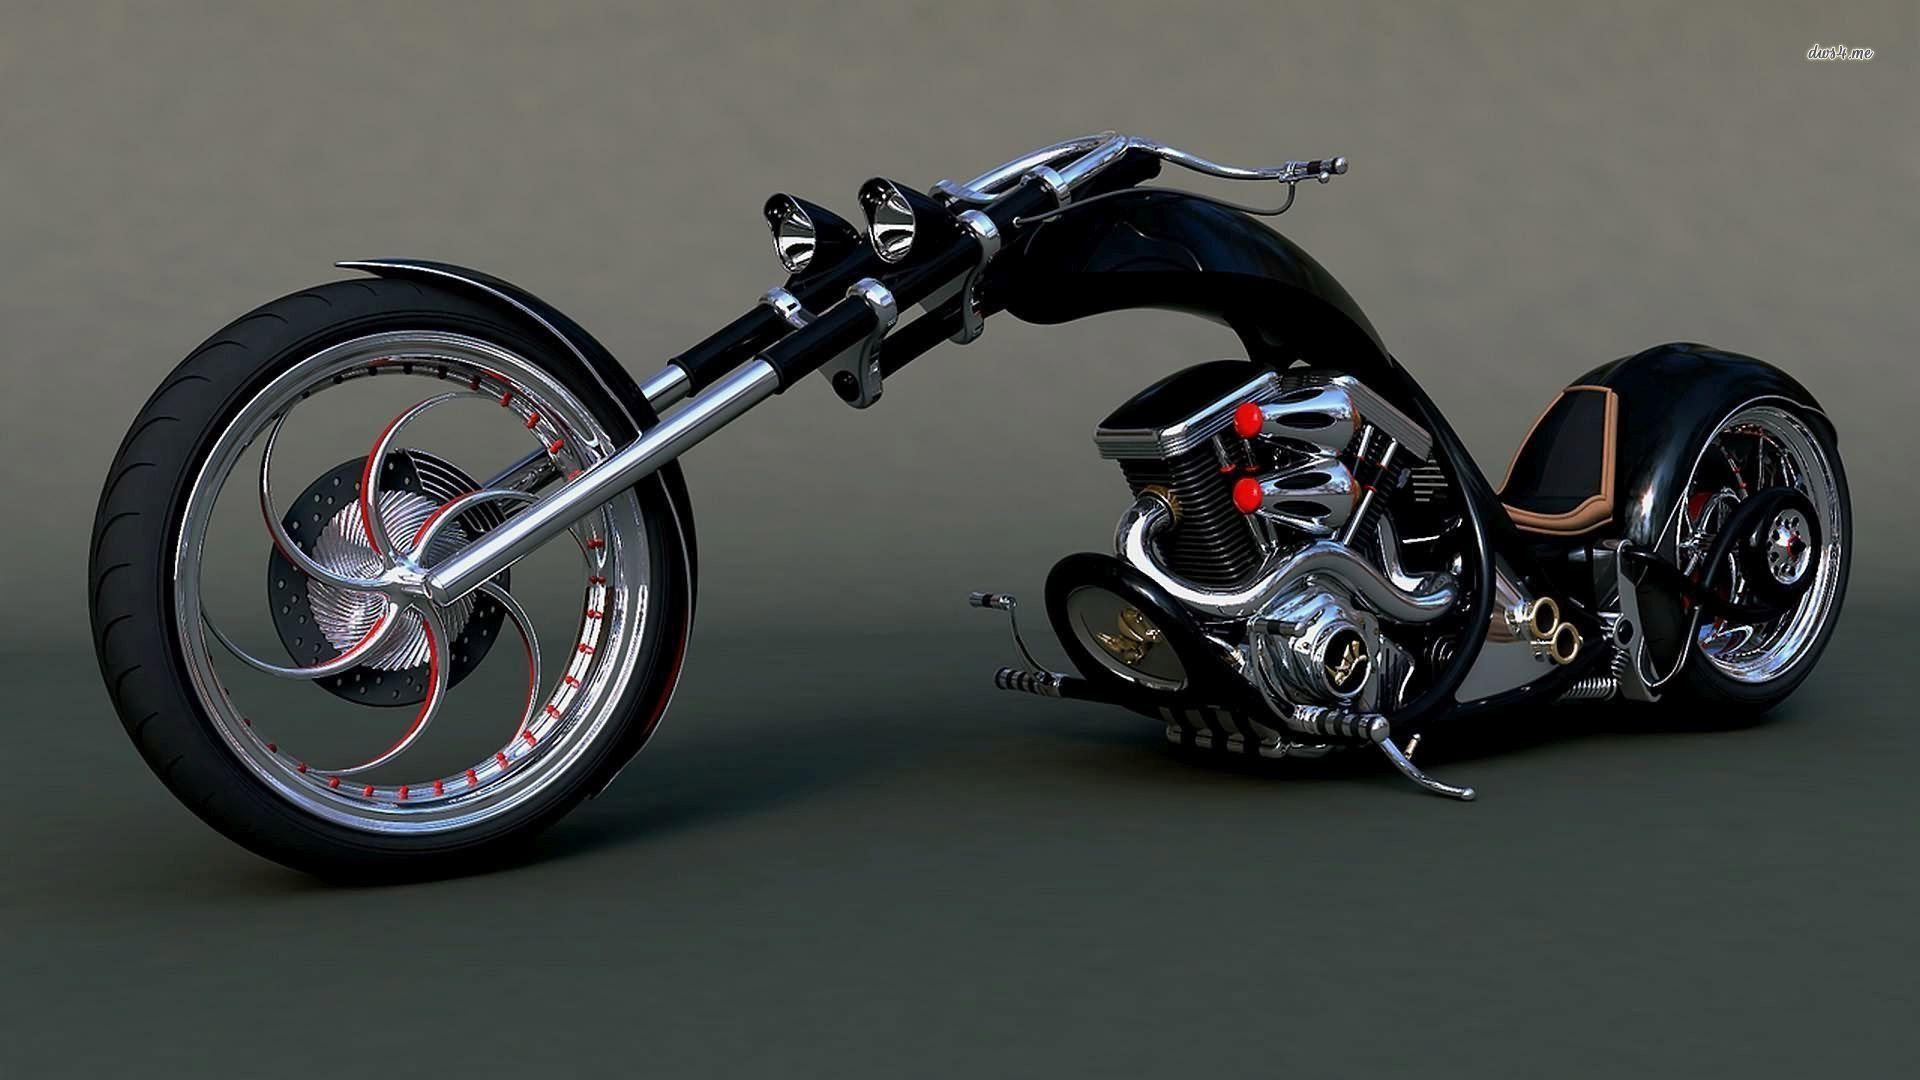 Hot Rods Wallpaper Google Search Dap Of Chopper Motorcycles 2